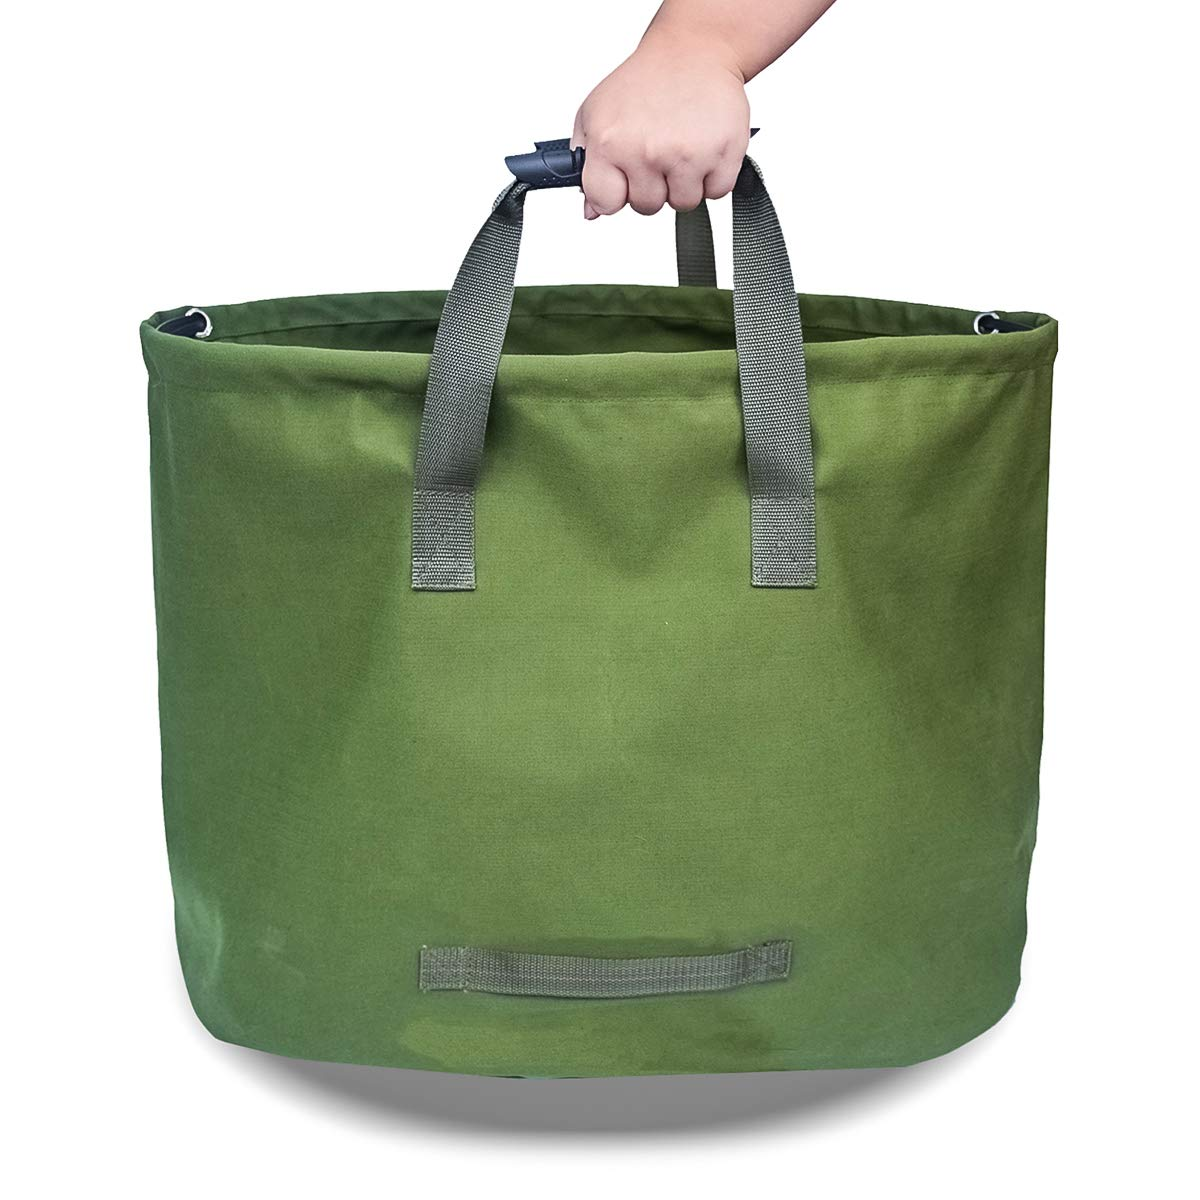 Ayunjia 33 Gallons Garden Lawn Litter Bag Green,Heavy Duty Garden Waste Bags for Garden Lawn Leaf Yard D22*H18inch